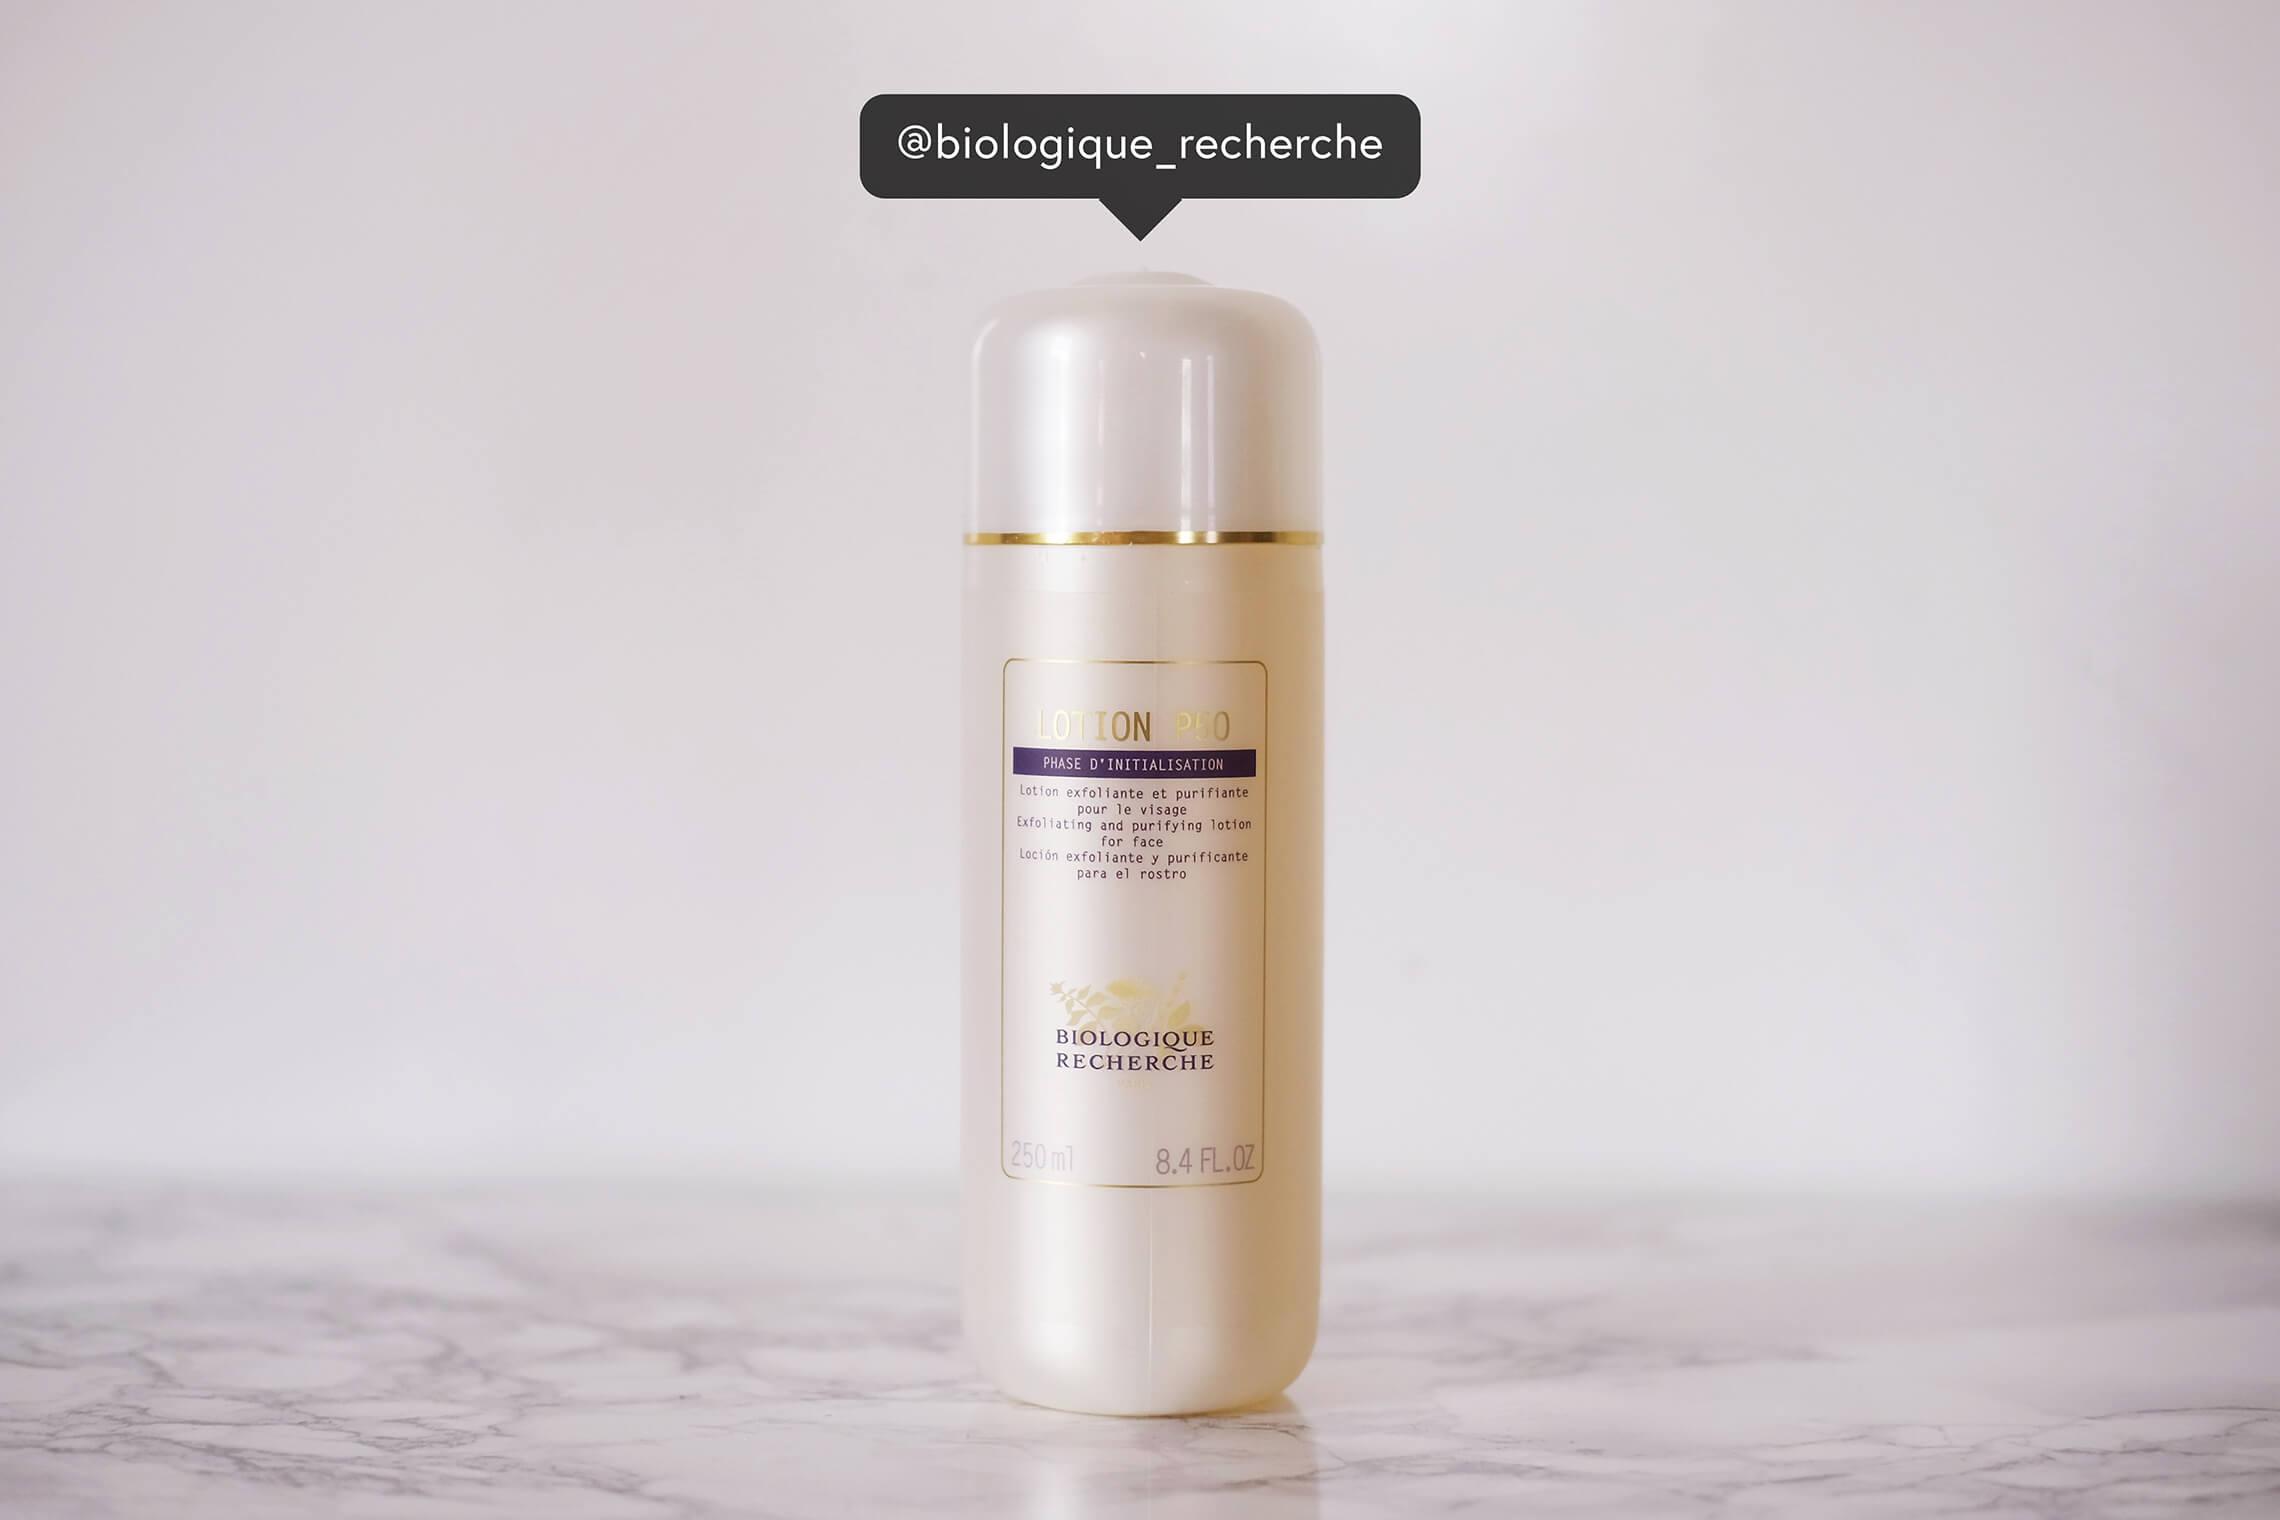 keiko lynn best skin care products 2018 biologique recherche lotion p50